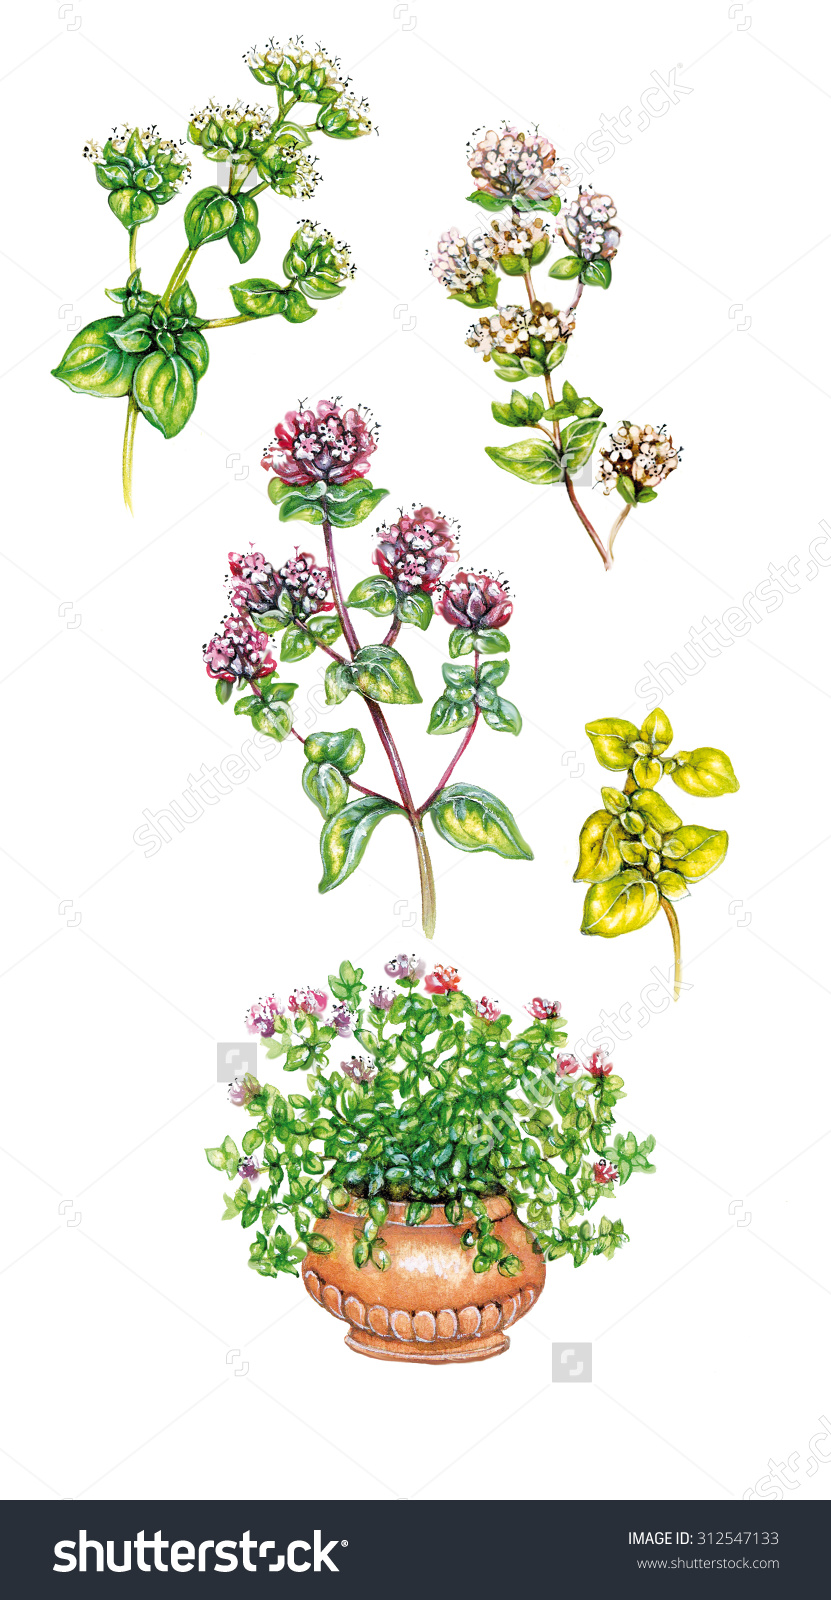 Realistic Illustration Of Different Subspecies Of Oregano Plant.